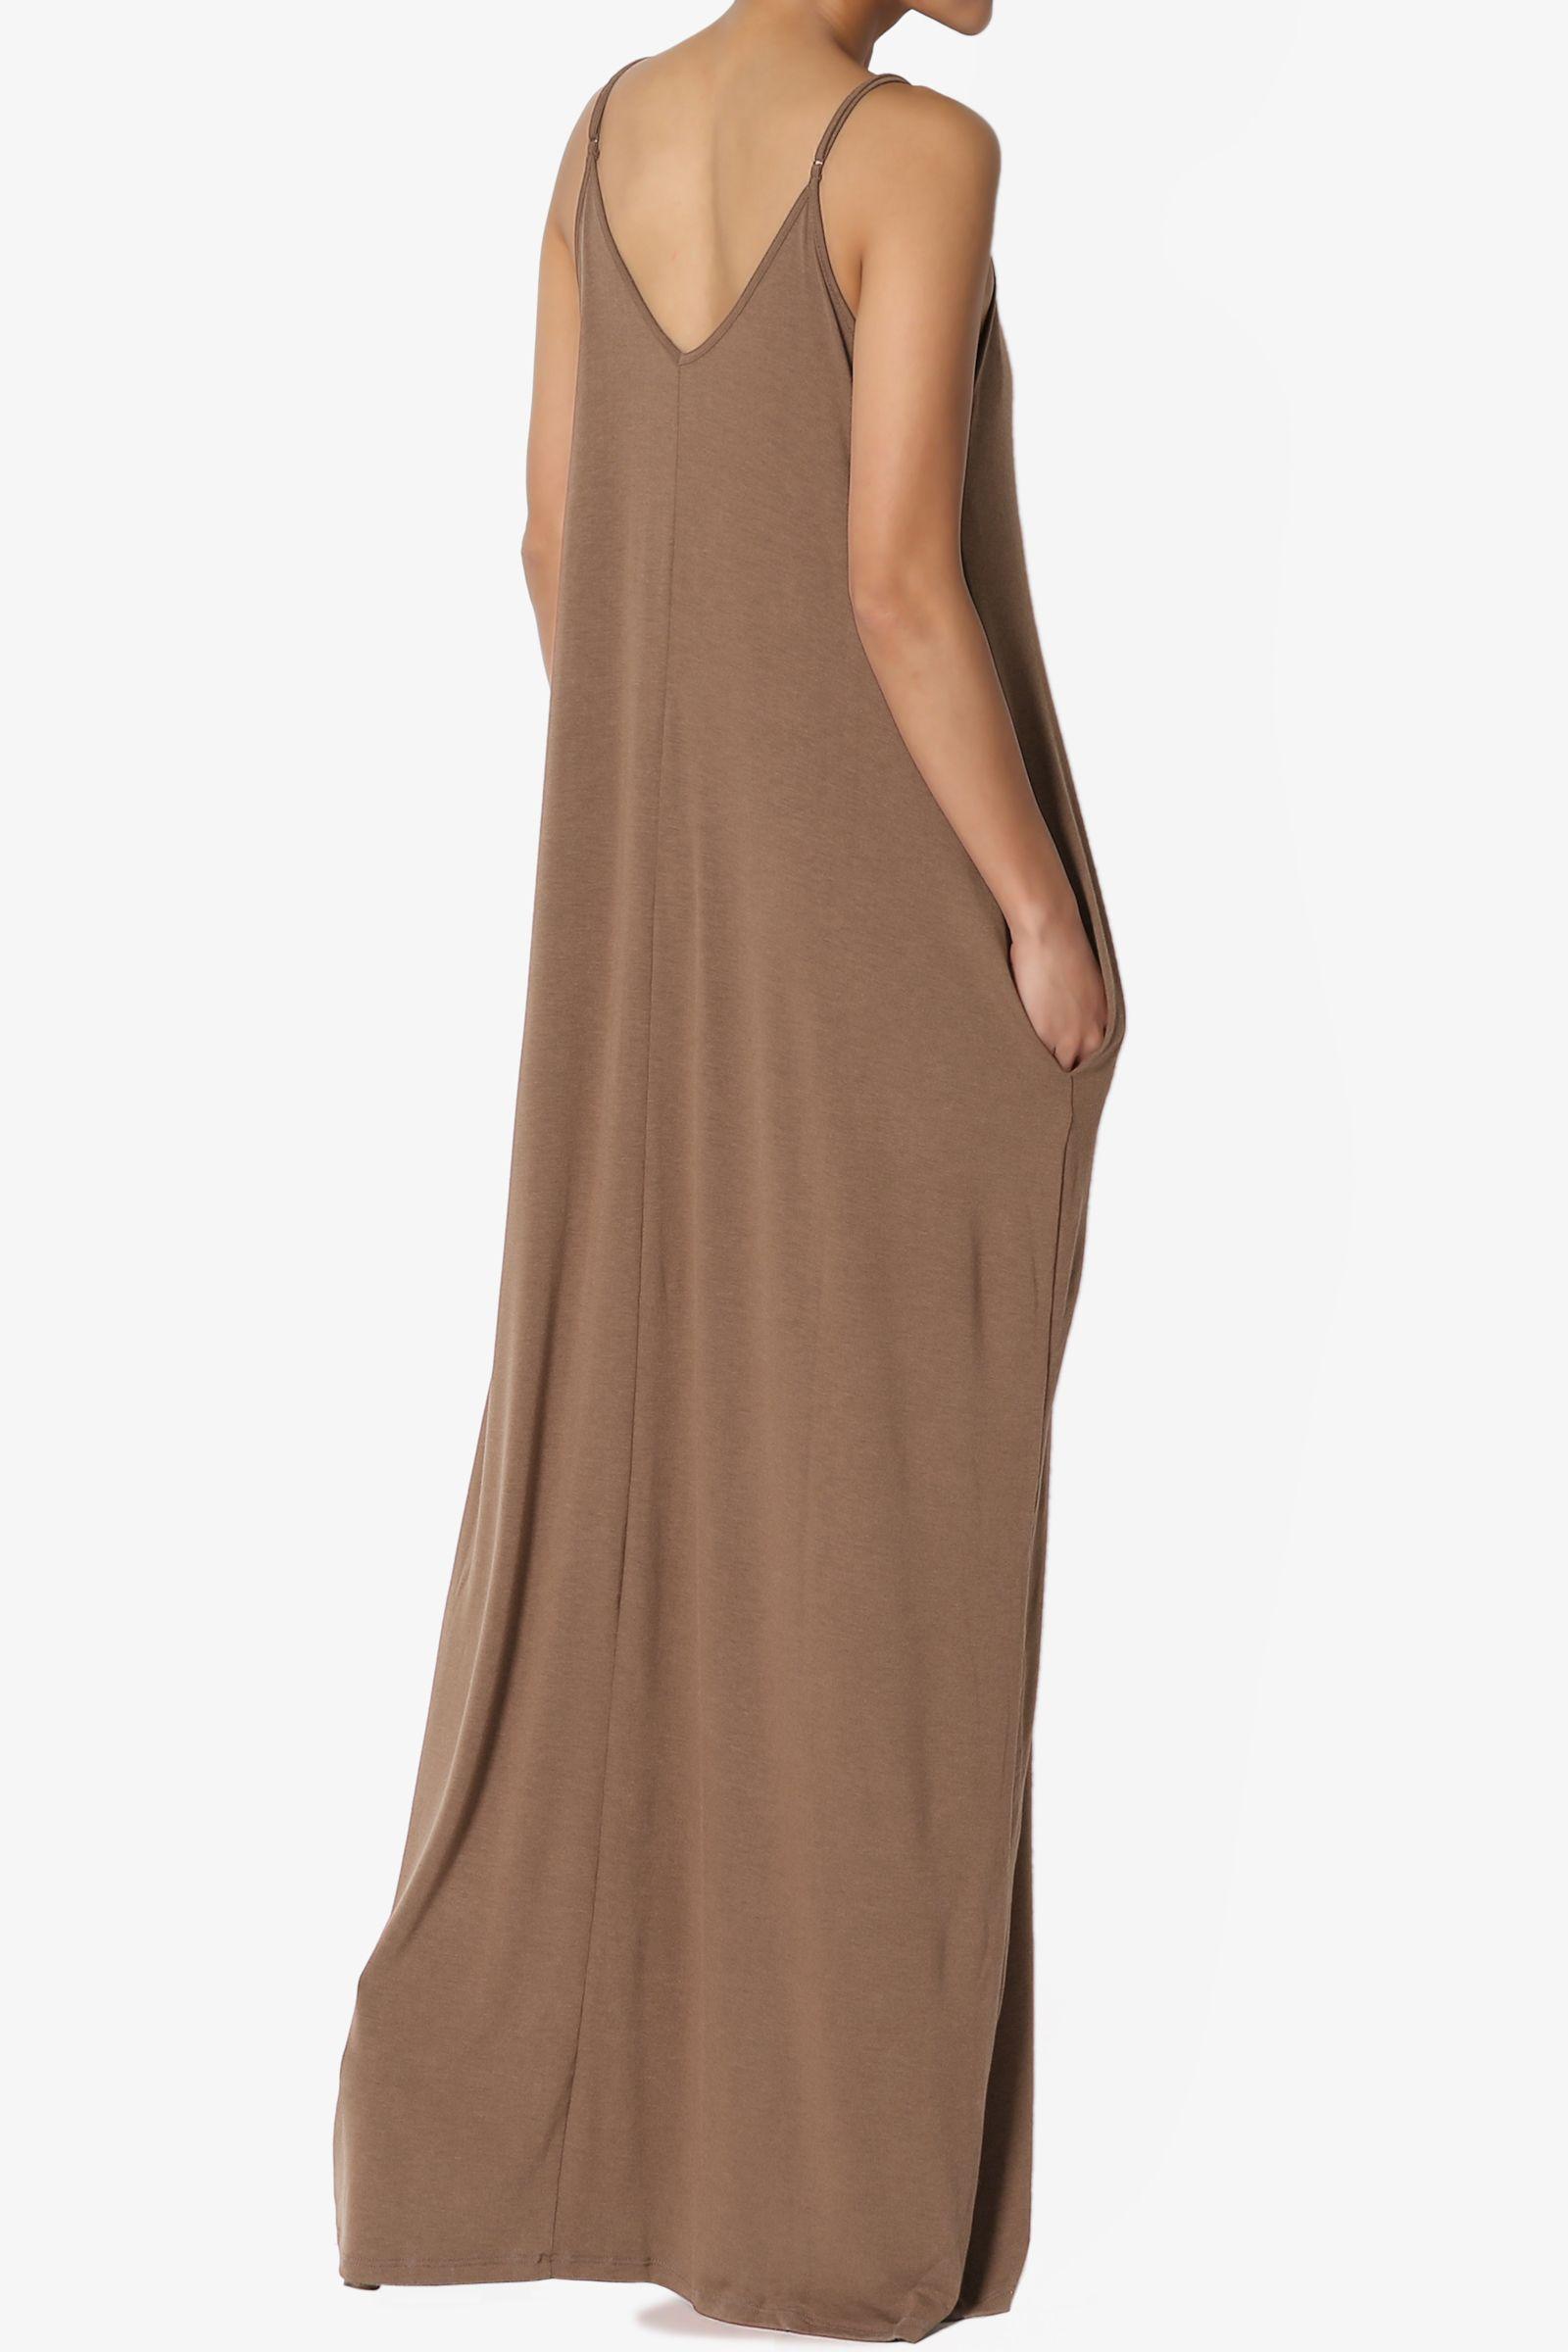 dbcf906f675 TheMogan Women s V-Neck Draped Jersey Casual Beach Cami Long Maxi Dress W  Pocket Draped